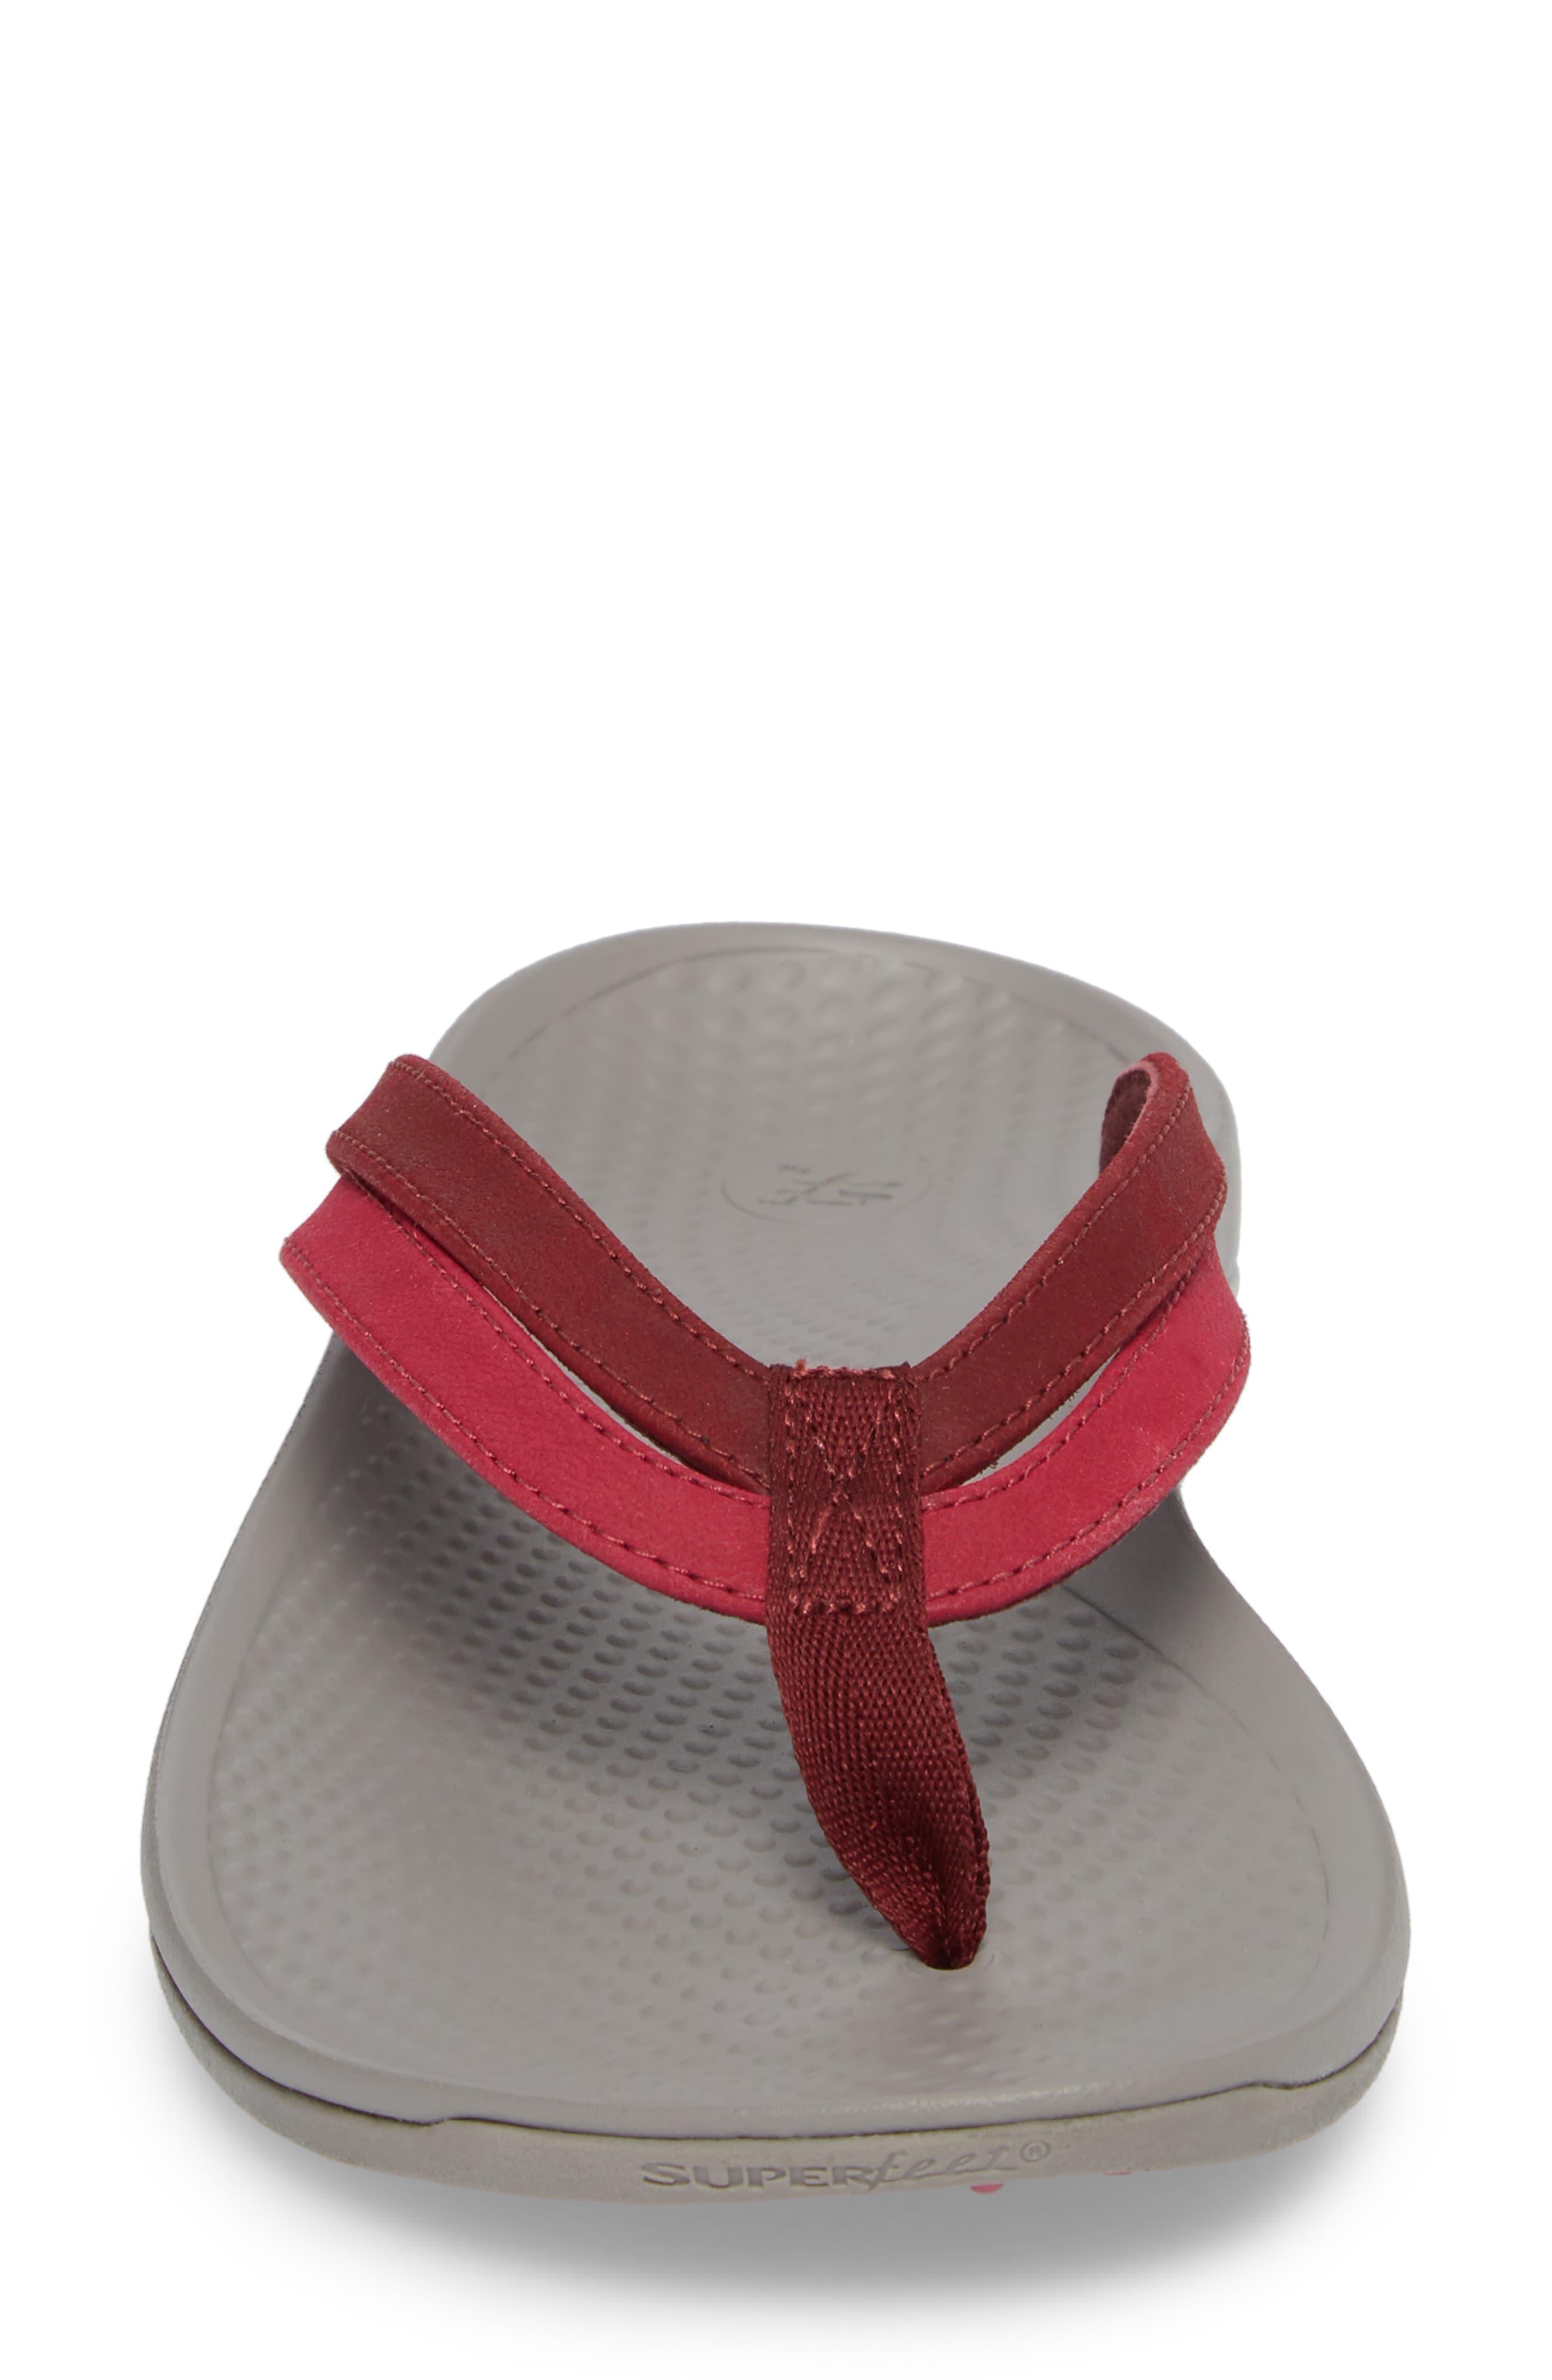 Rose Flip Flop,                             Alternate thumbnail 4, color,                             Red Faux Leather